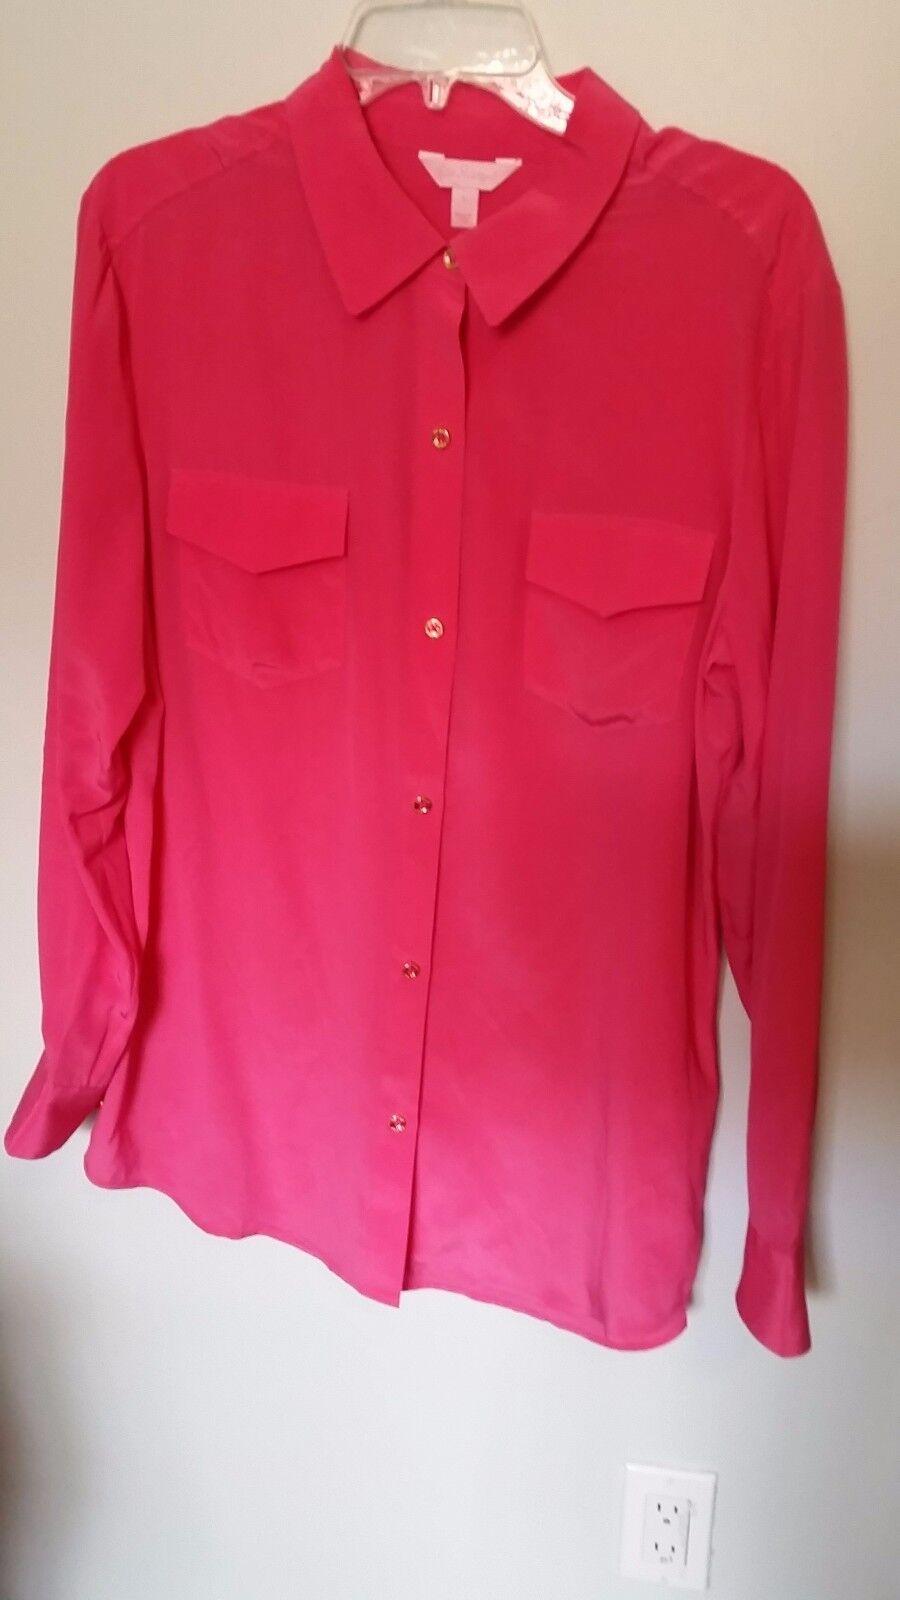 Lilly Pulitzer Rosa Silk Button Blouse - Größe L